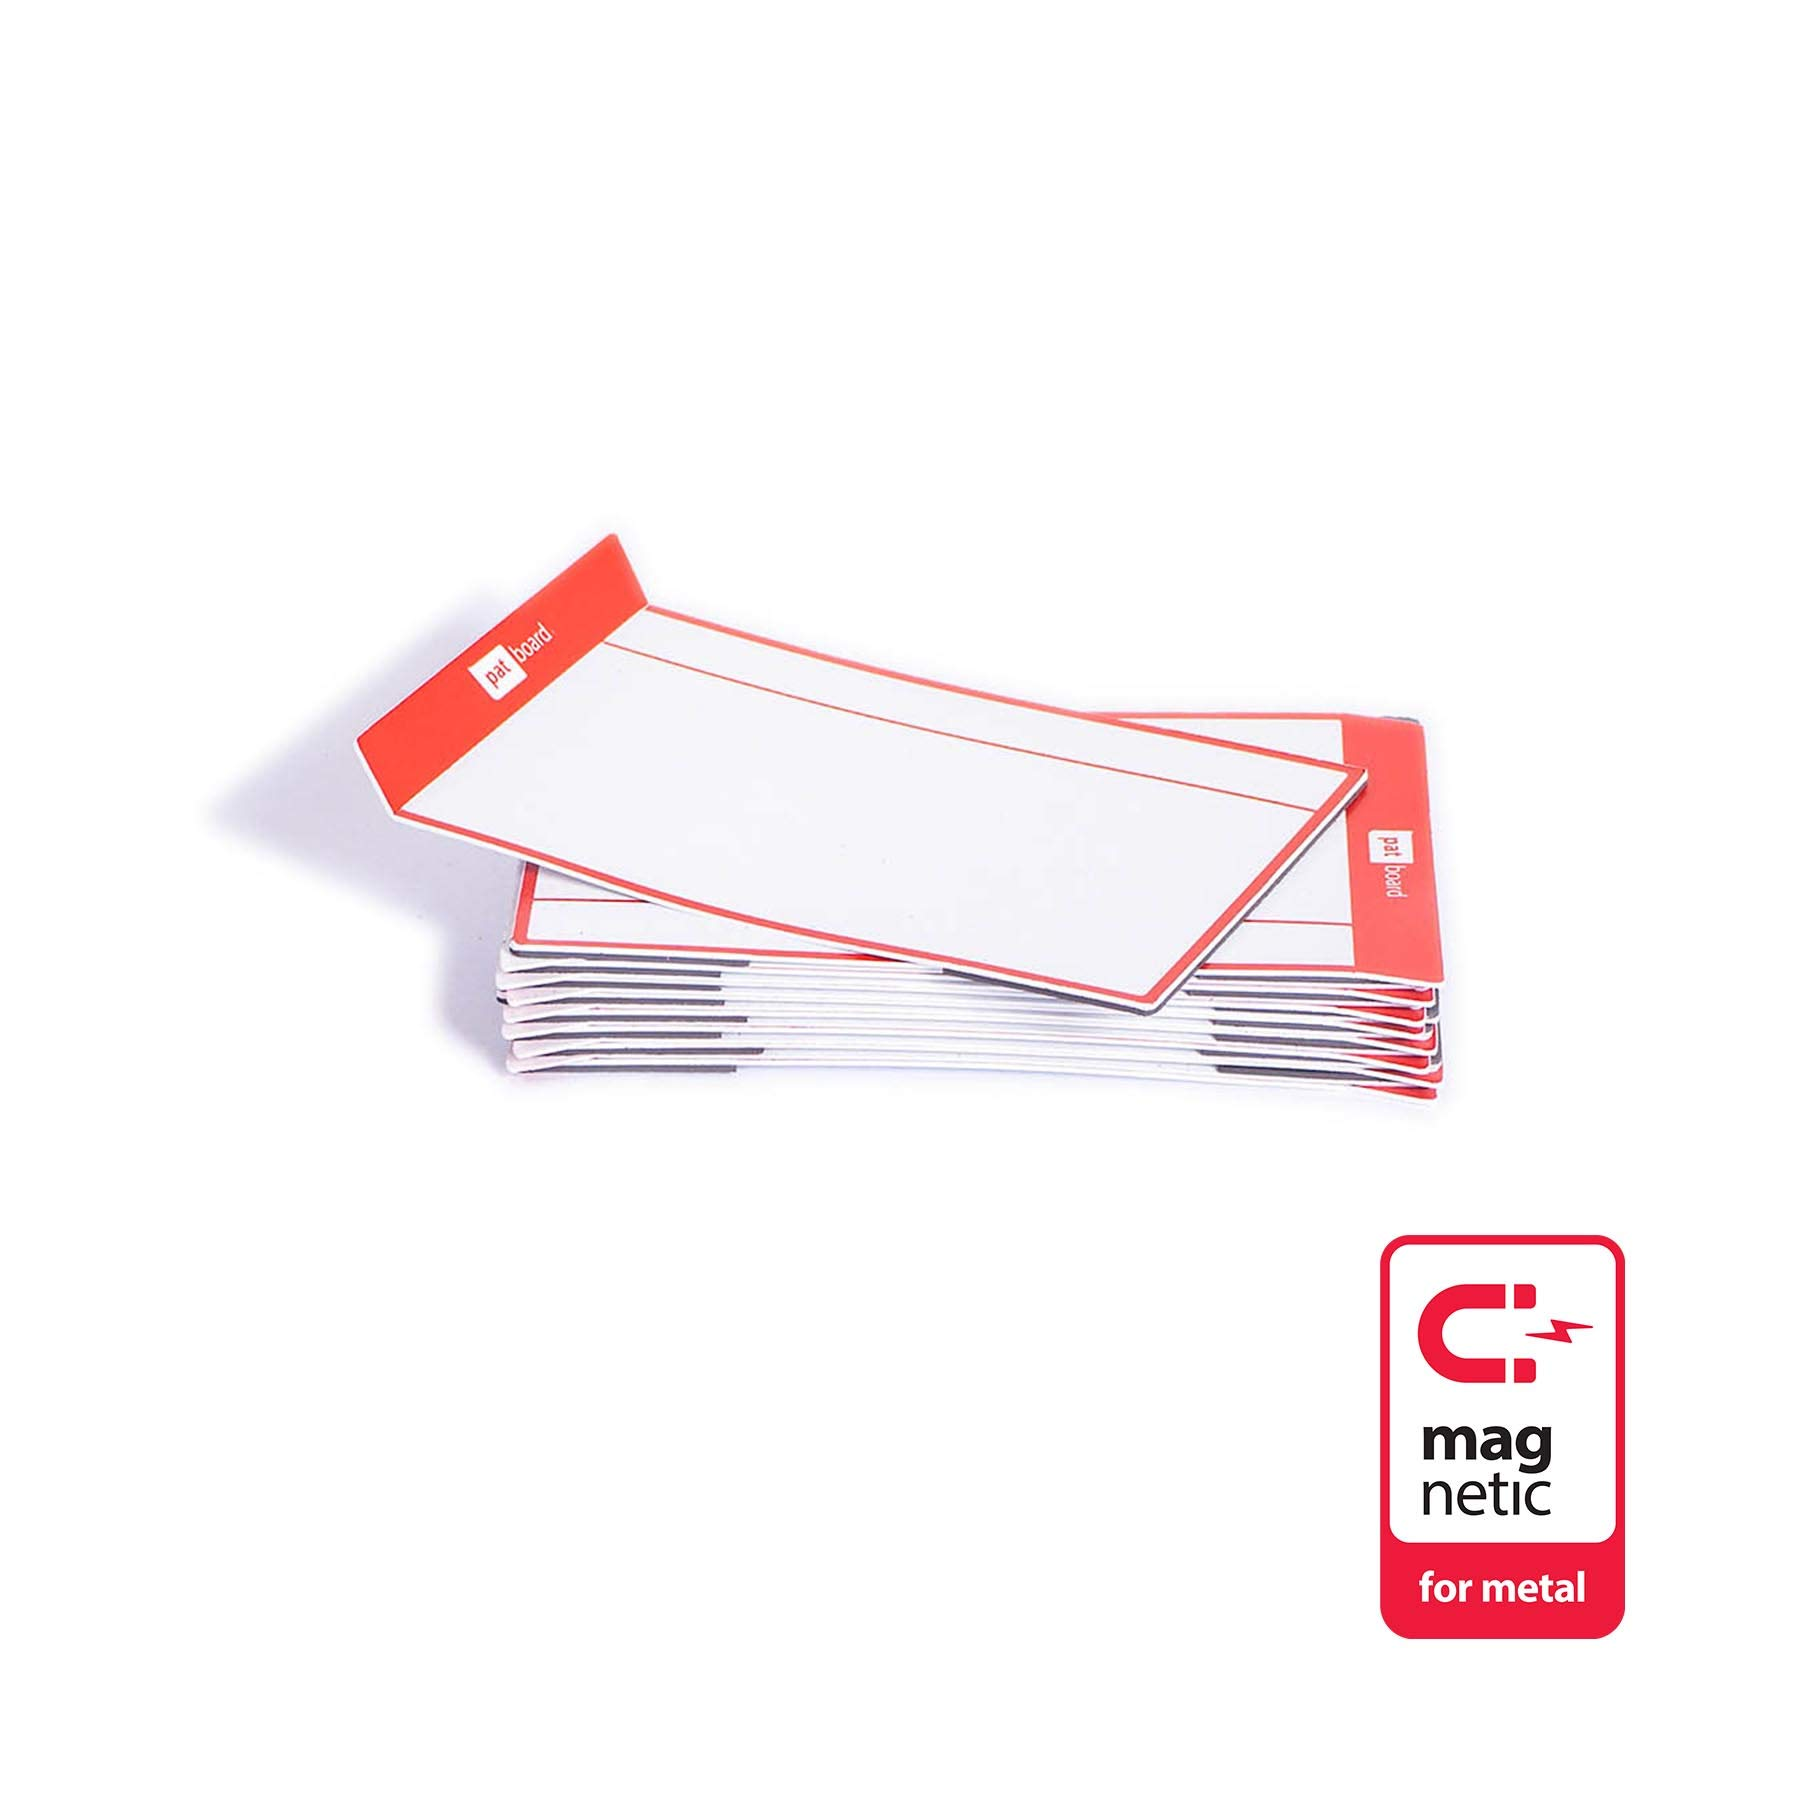 PATboard Scrum and Kanban Board Medium TASKcards Magnetic - Red